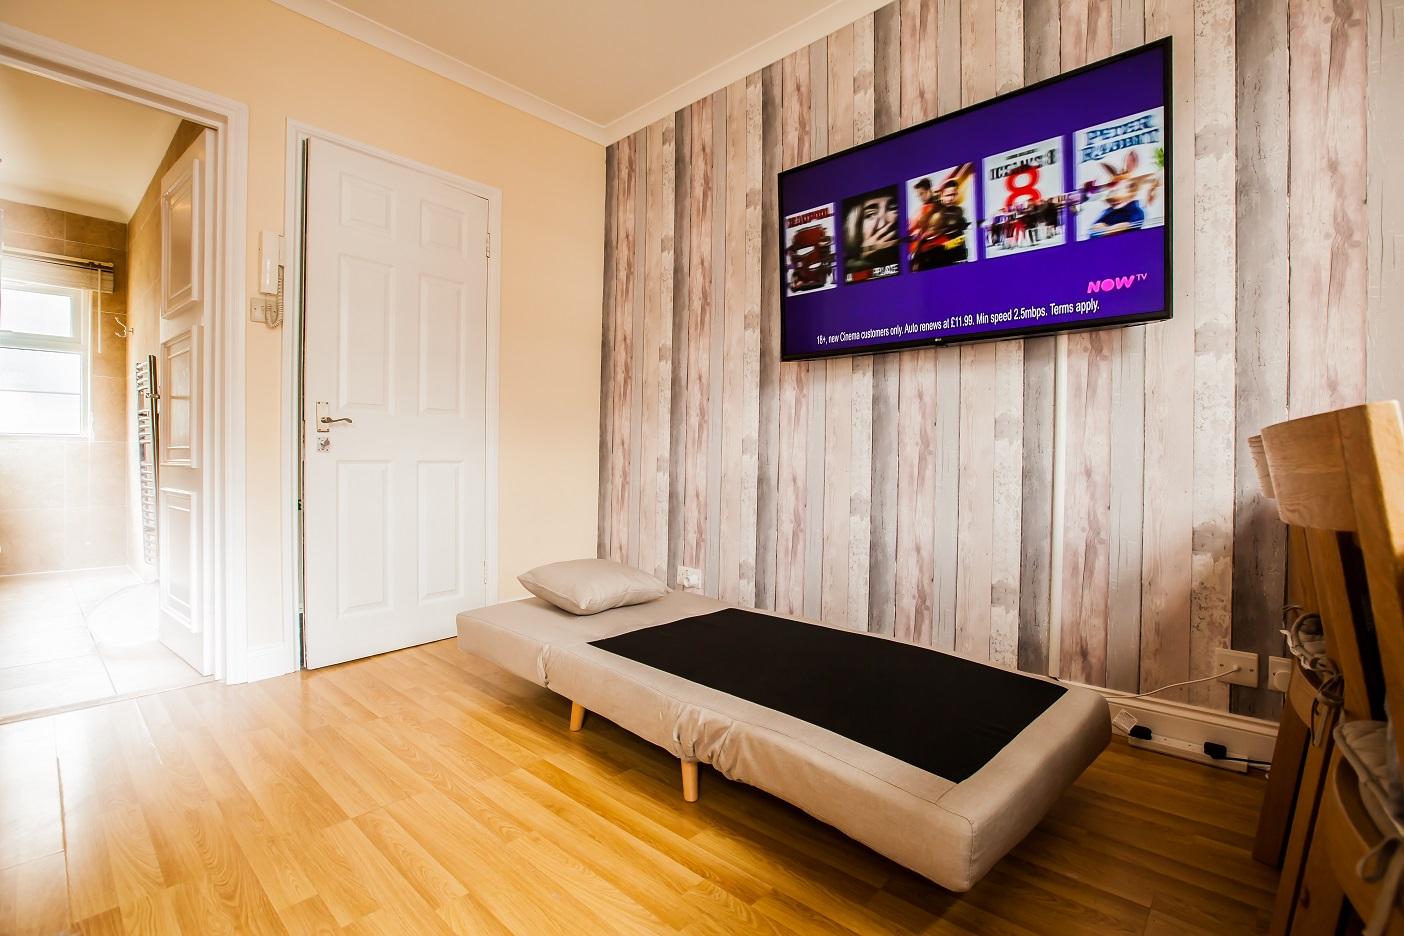 Sofa Bed at Marylebone Serviced Apartments, Marylebone, London - Citybase Apartments